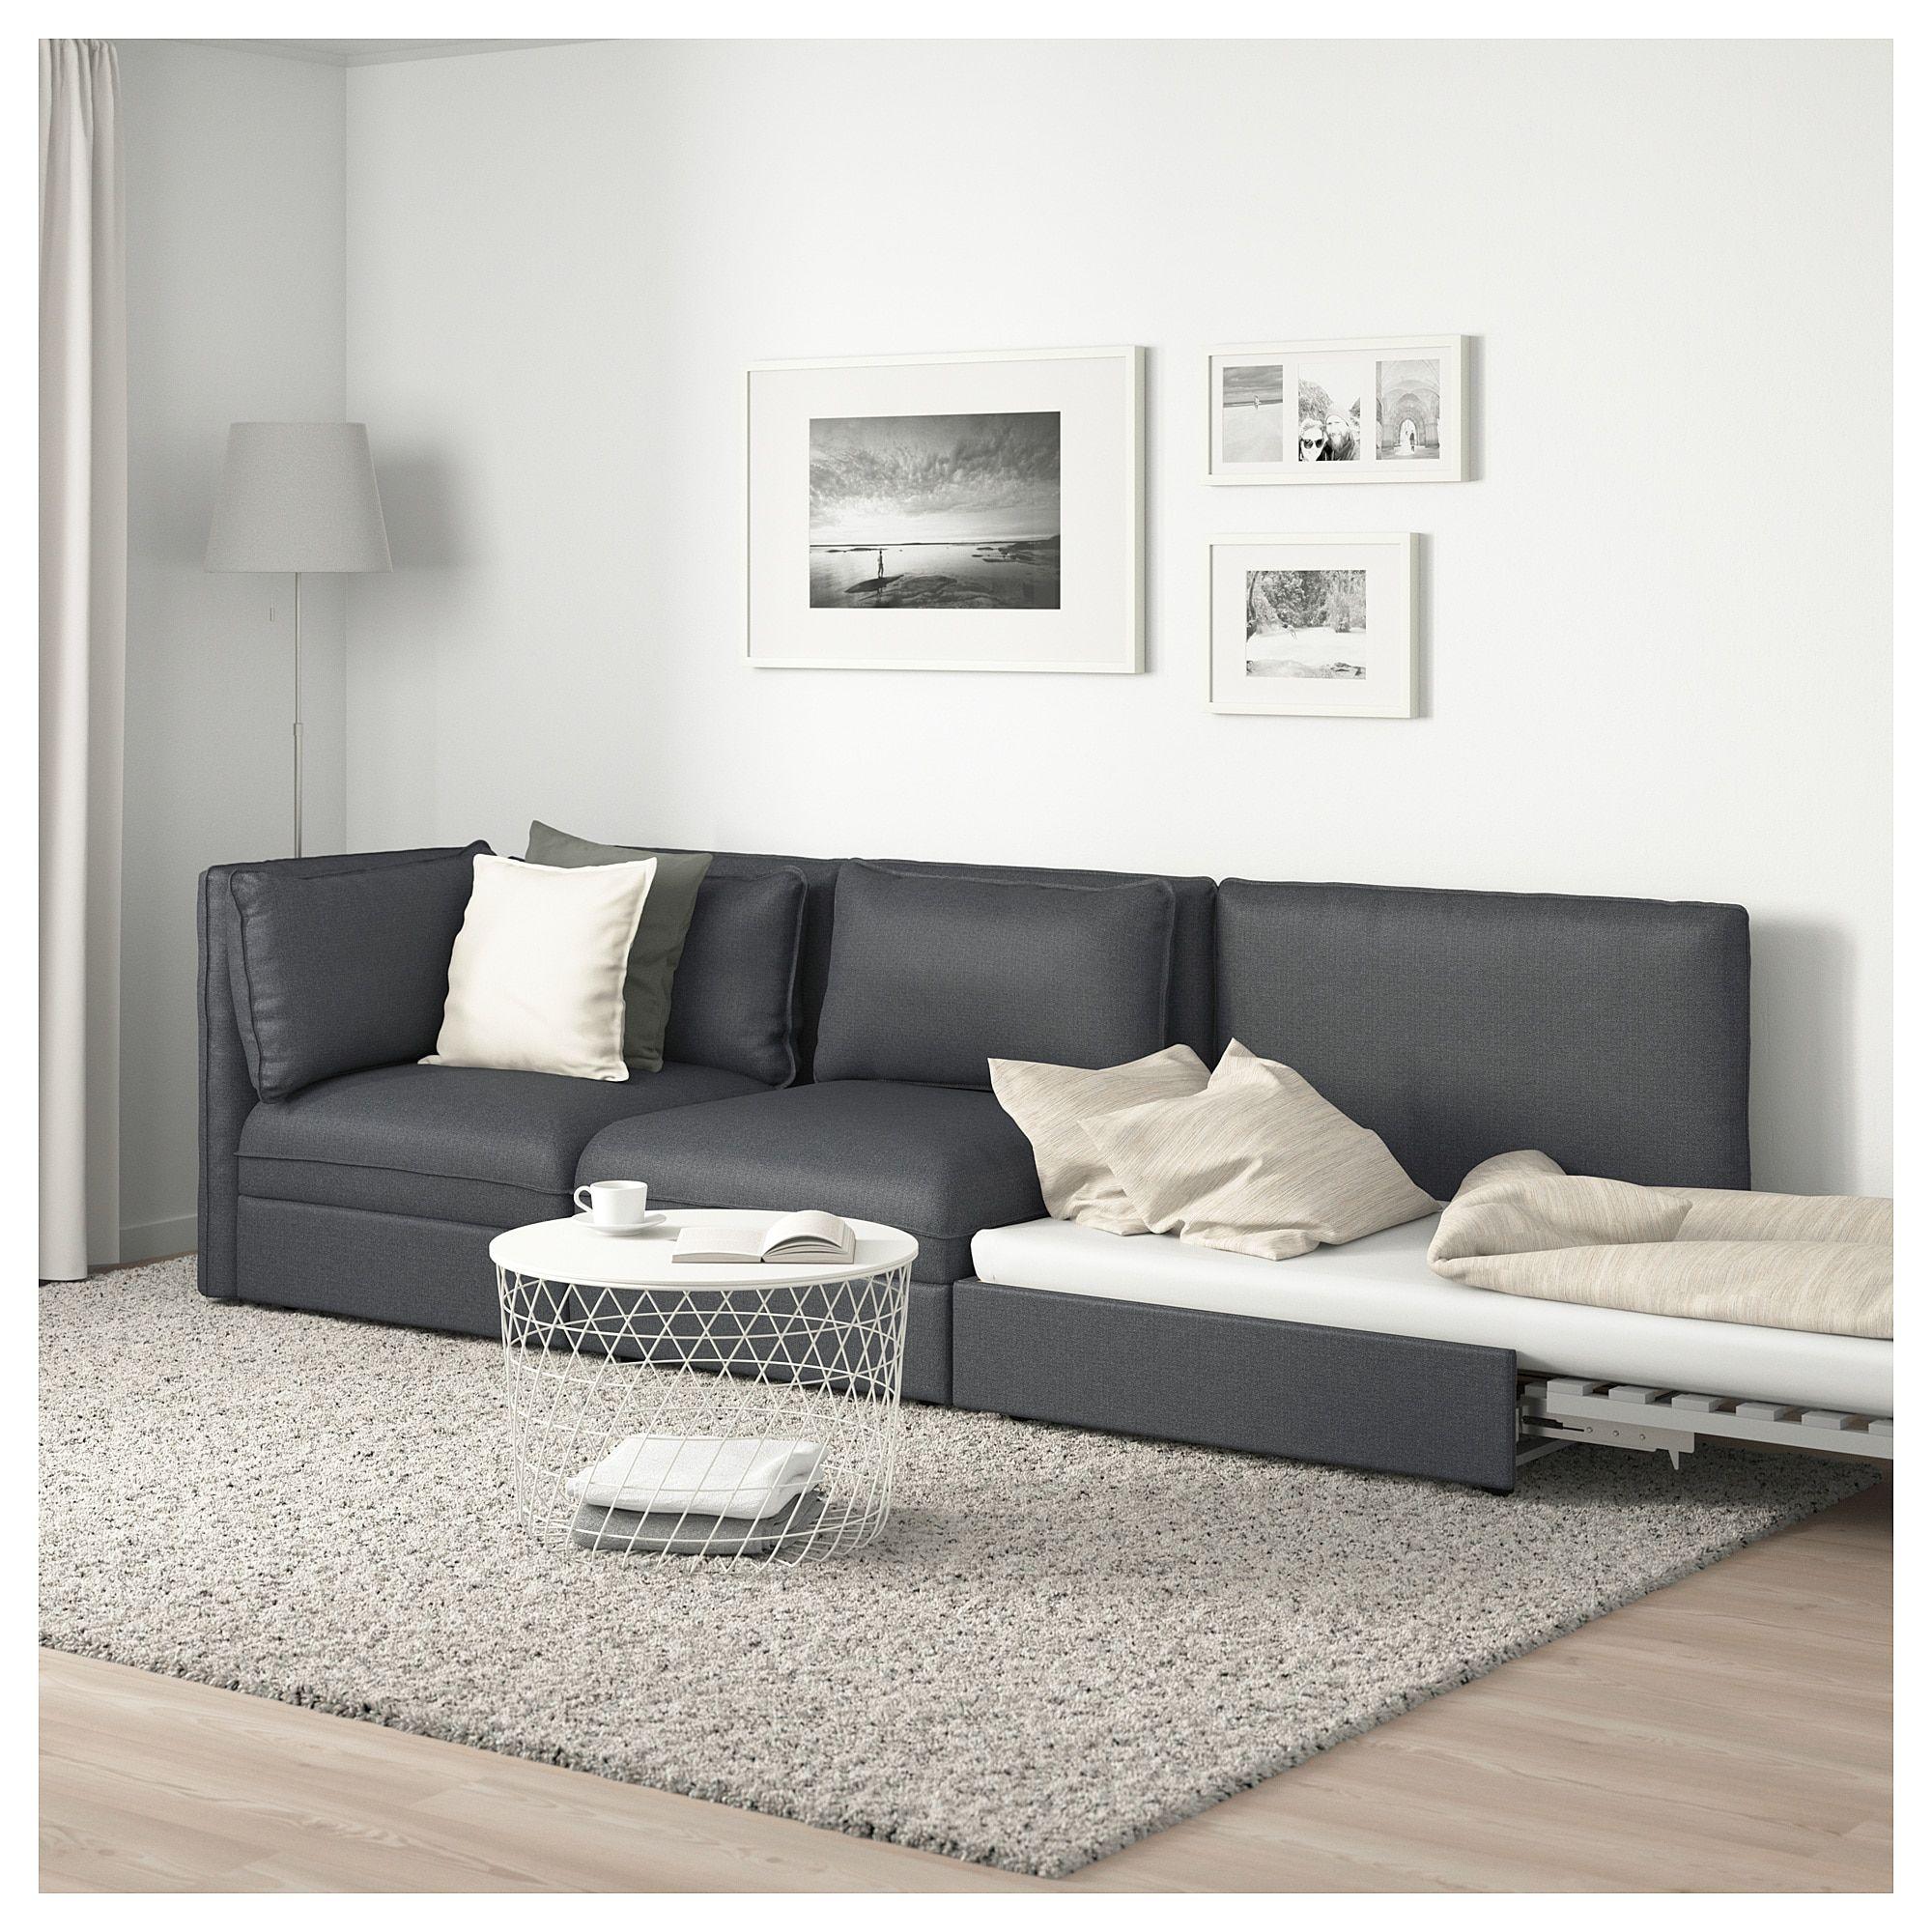 Us Furniture And Home Furnishings Sleeper Sofa Sofa